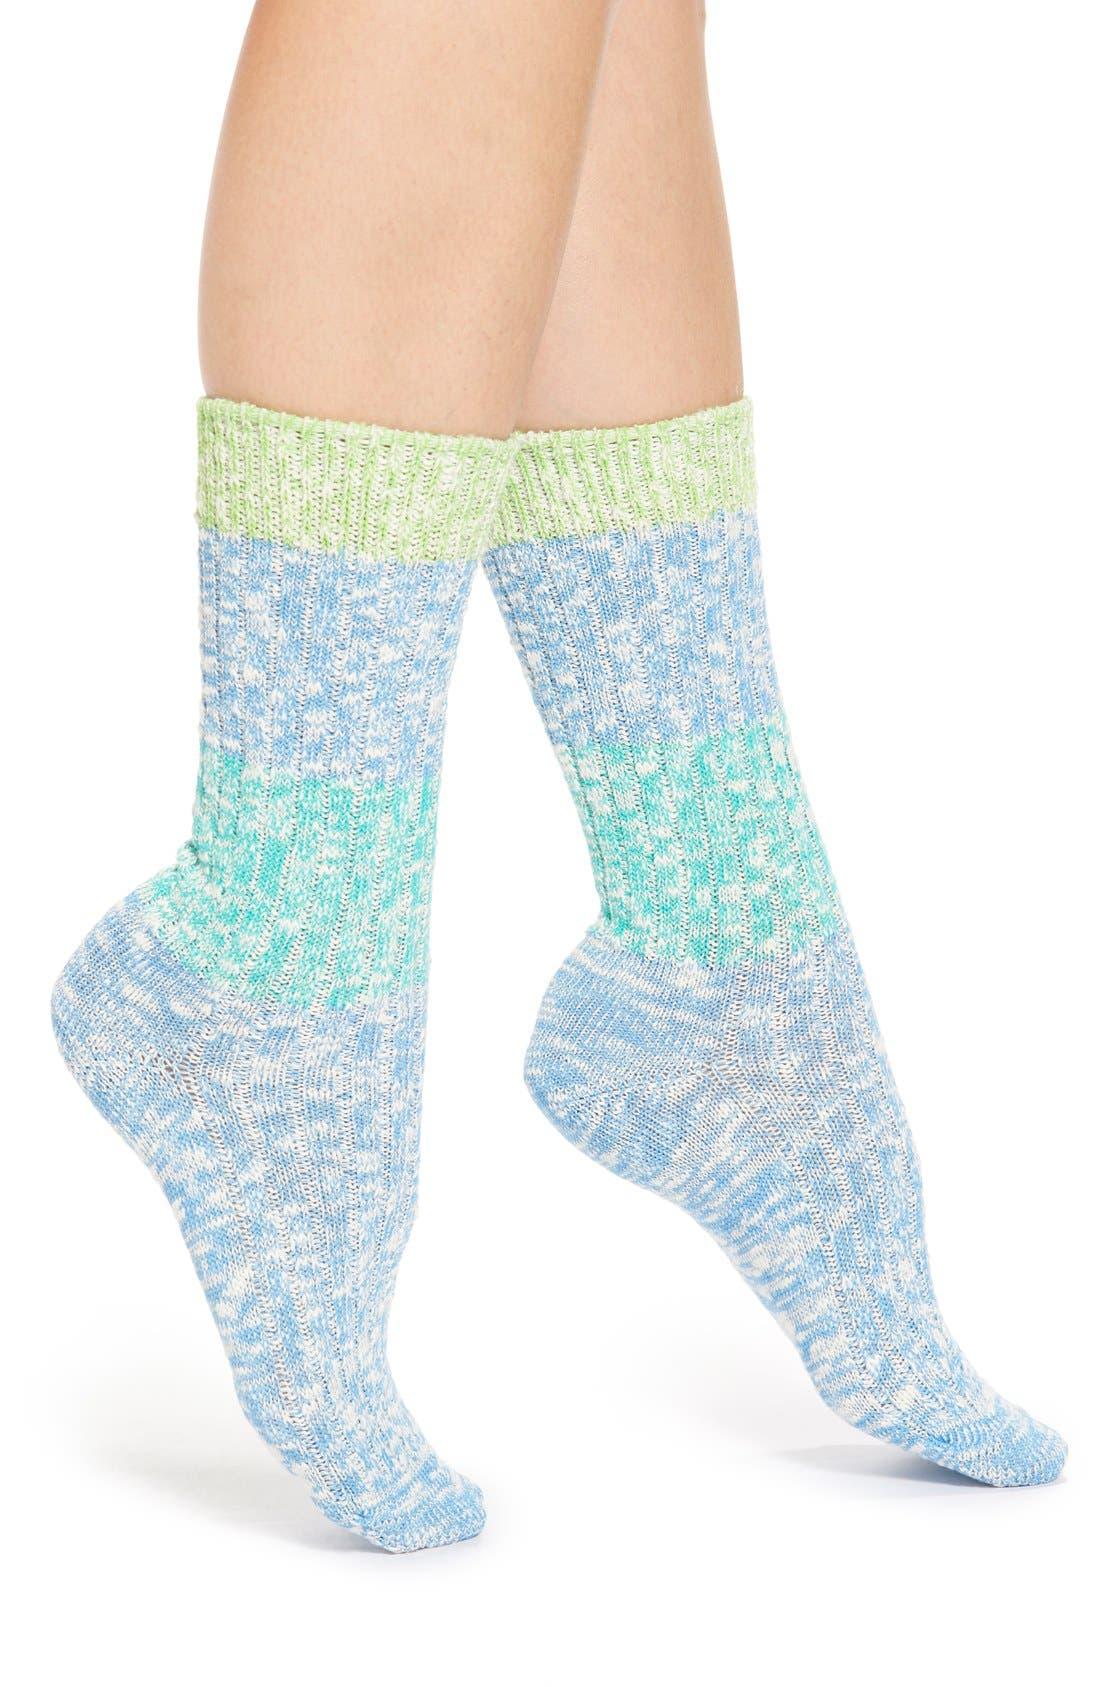 Main Image - Wigwam 'Capri' Crew Socks